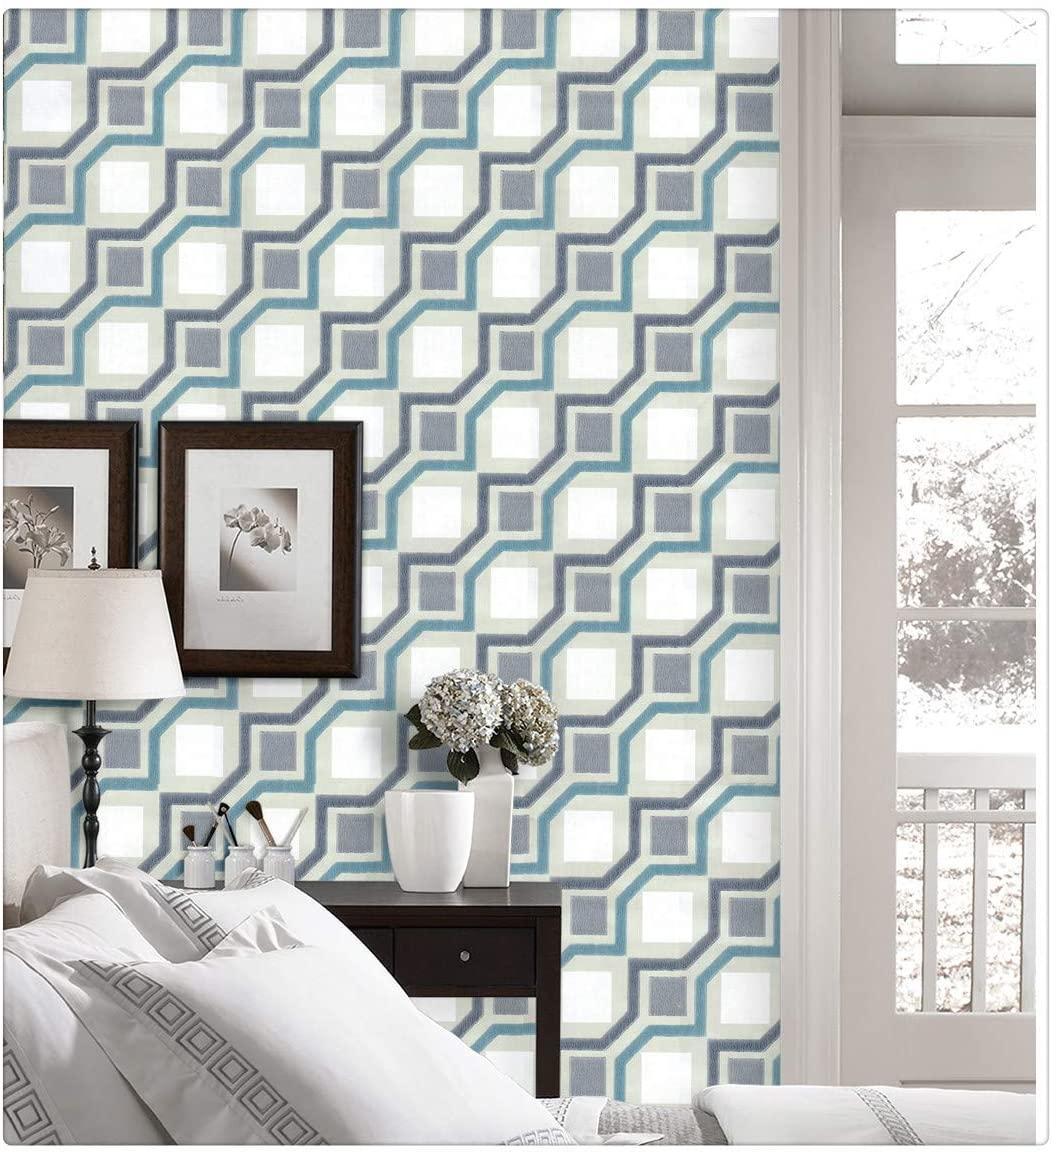 DWIND D1335-1 Vinyl 3D Contemporary Self Adhesive Wallpaper Geometric Stripes Peel & Stick Wallpaper Colourful Square for Livingroom Bedroom